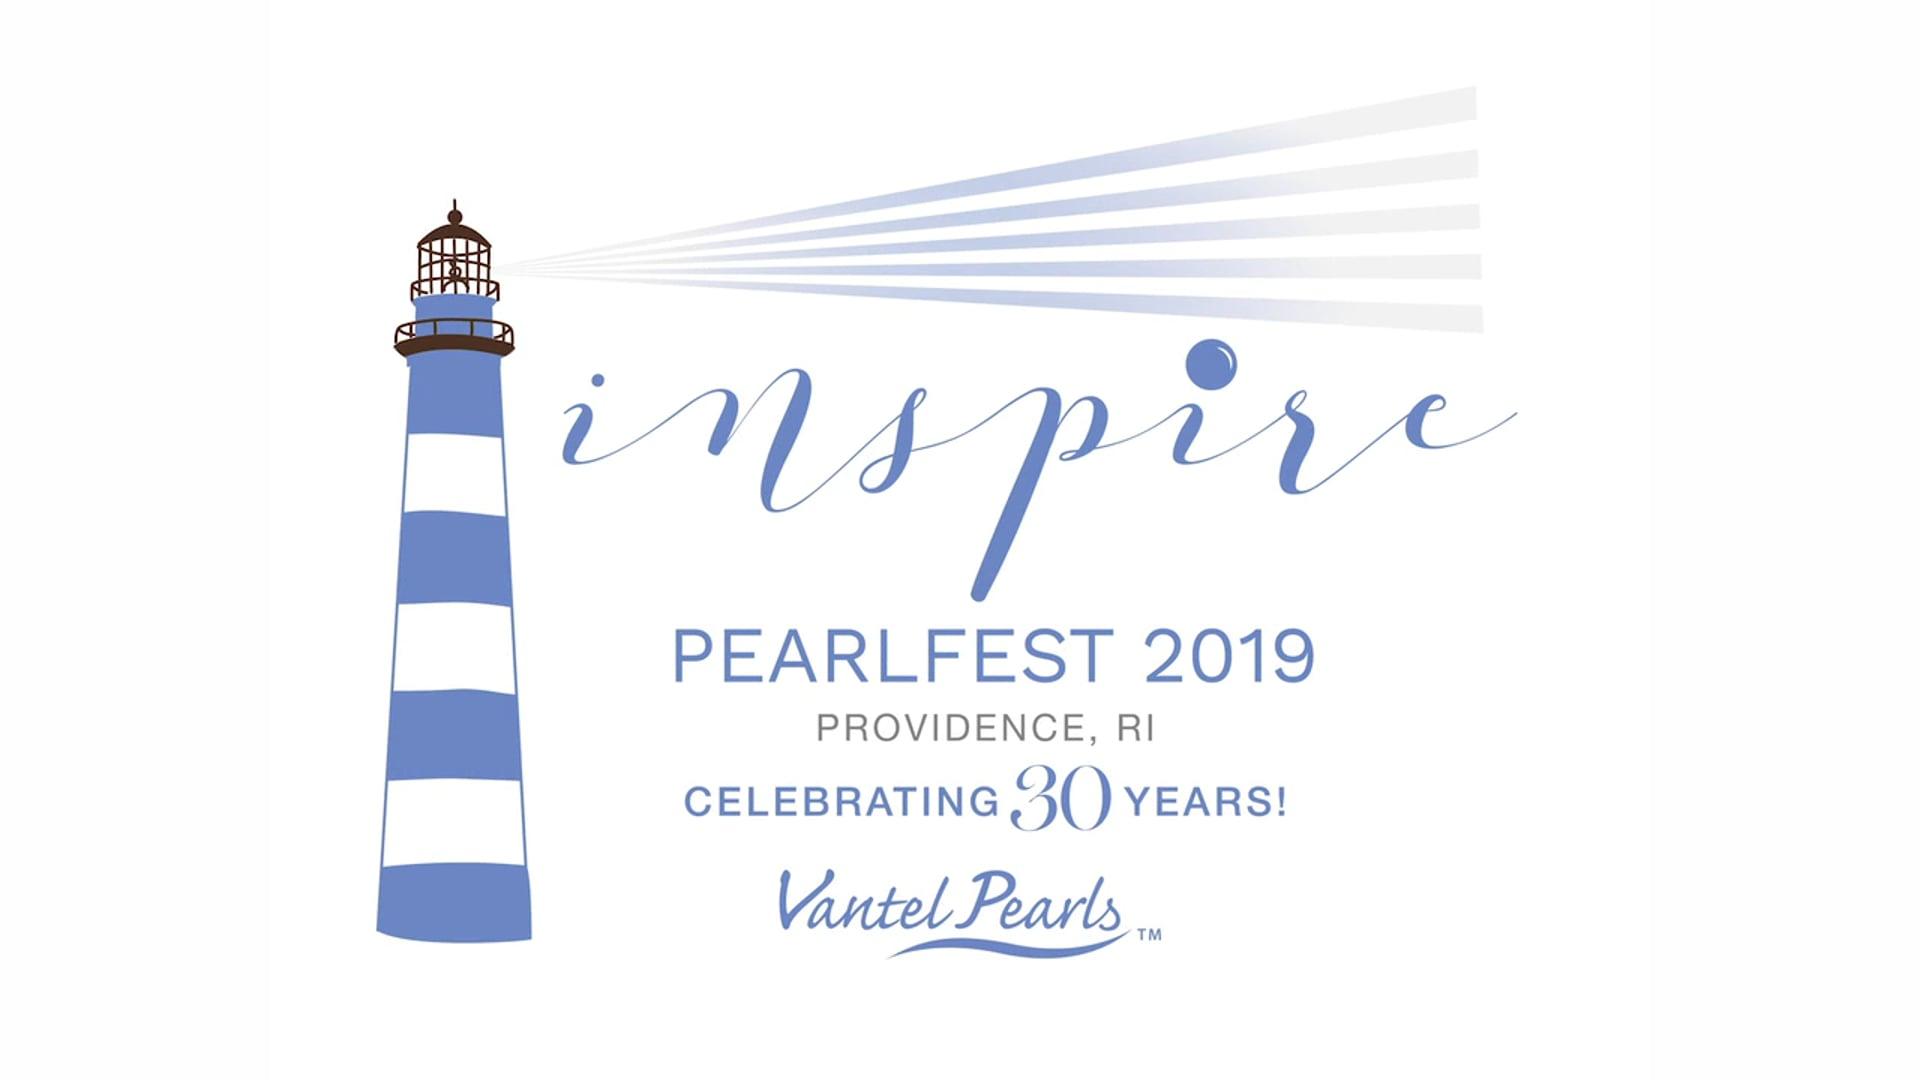 2019 PearlFest Highlights